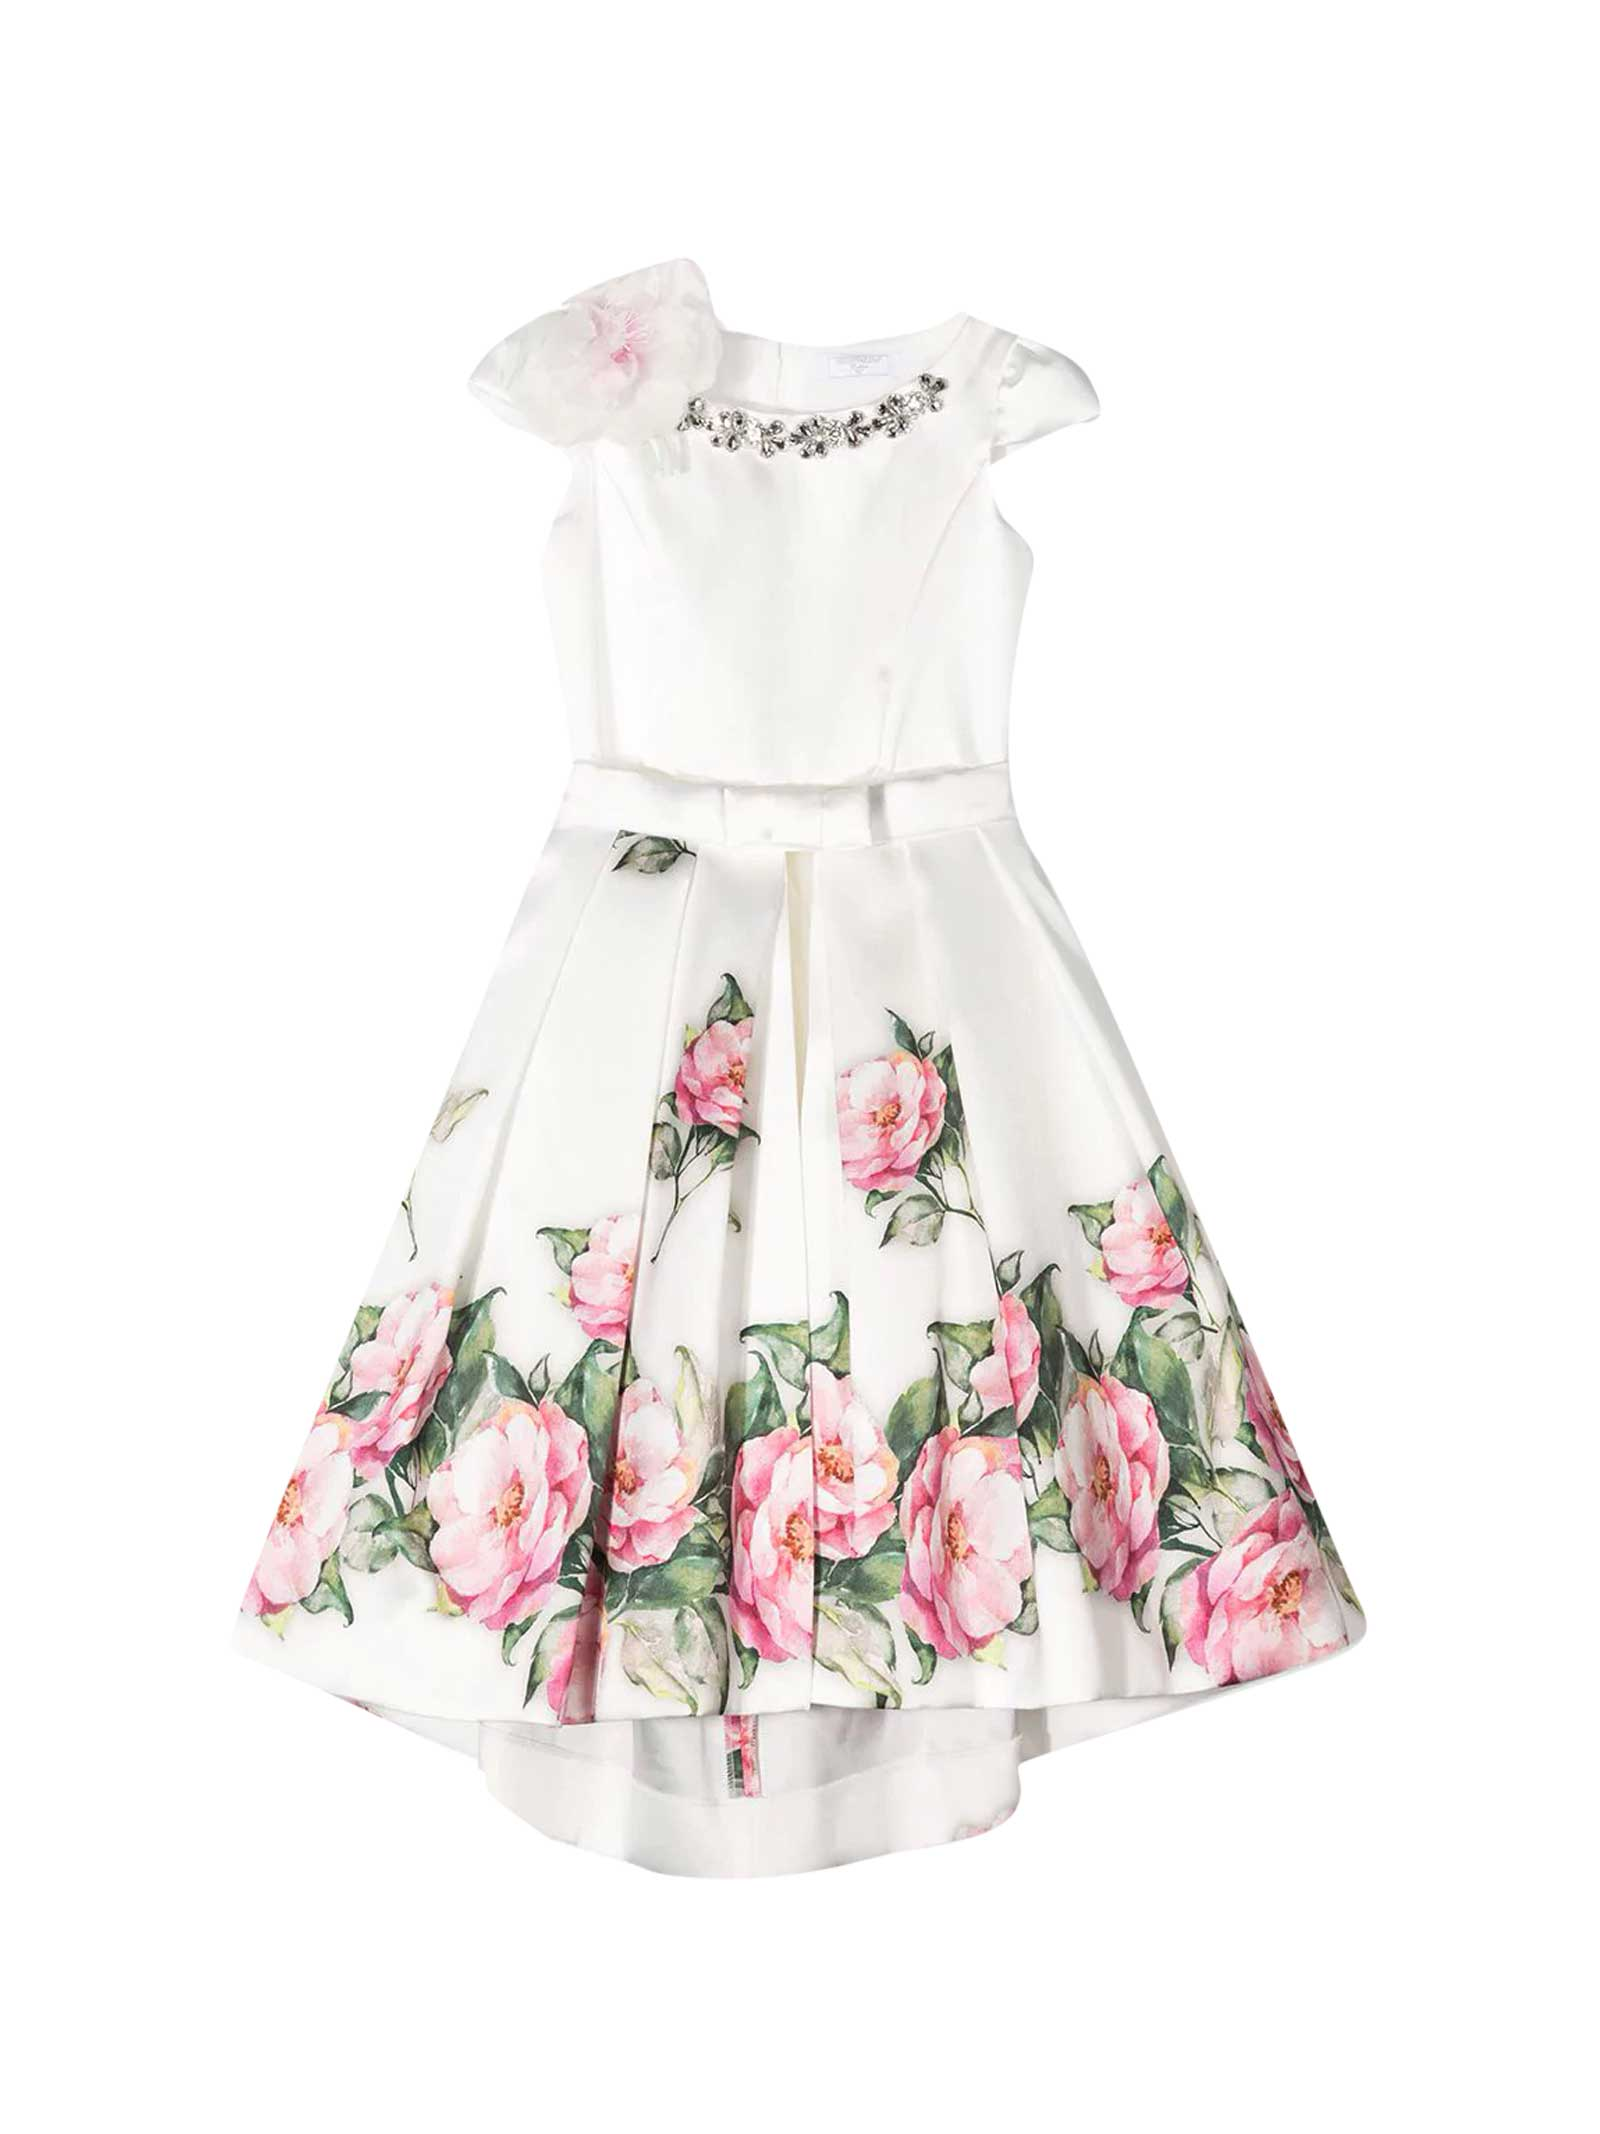 Monnalisa Monnalisa White Dress